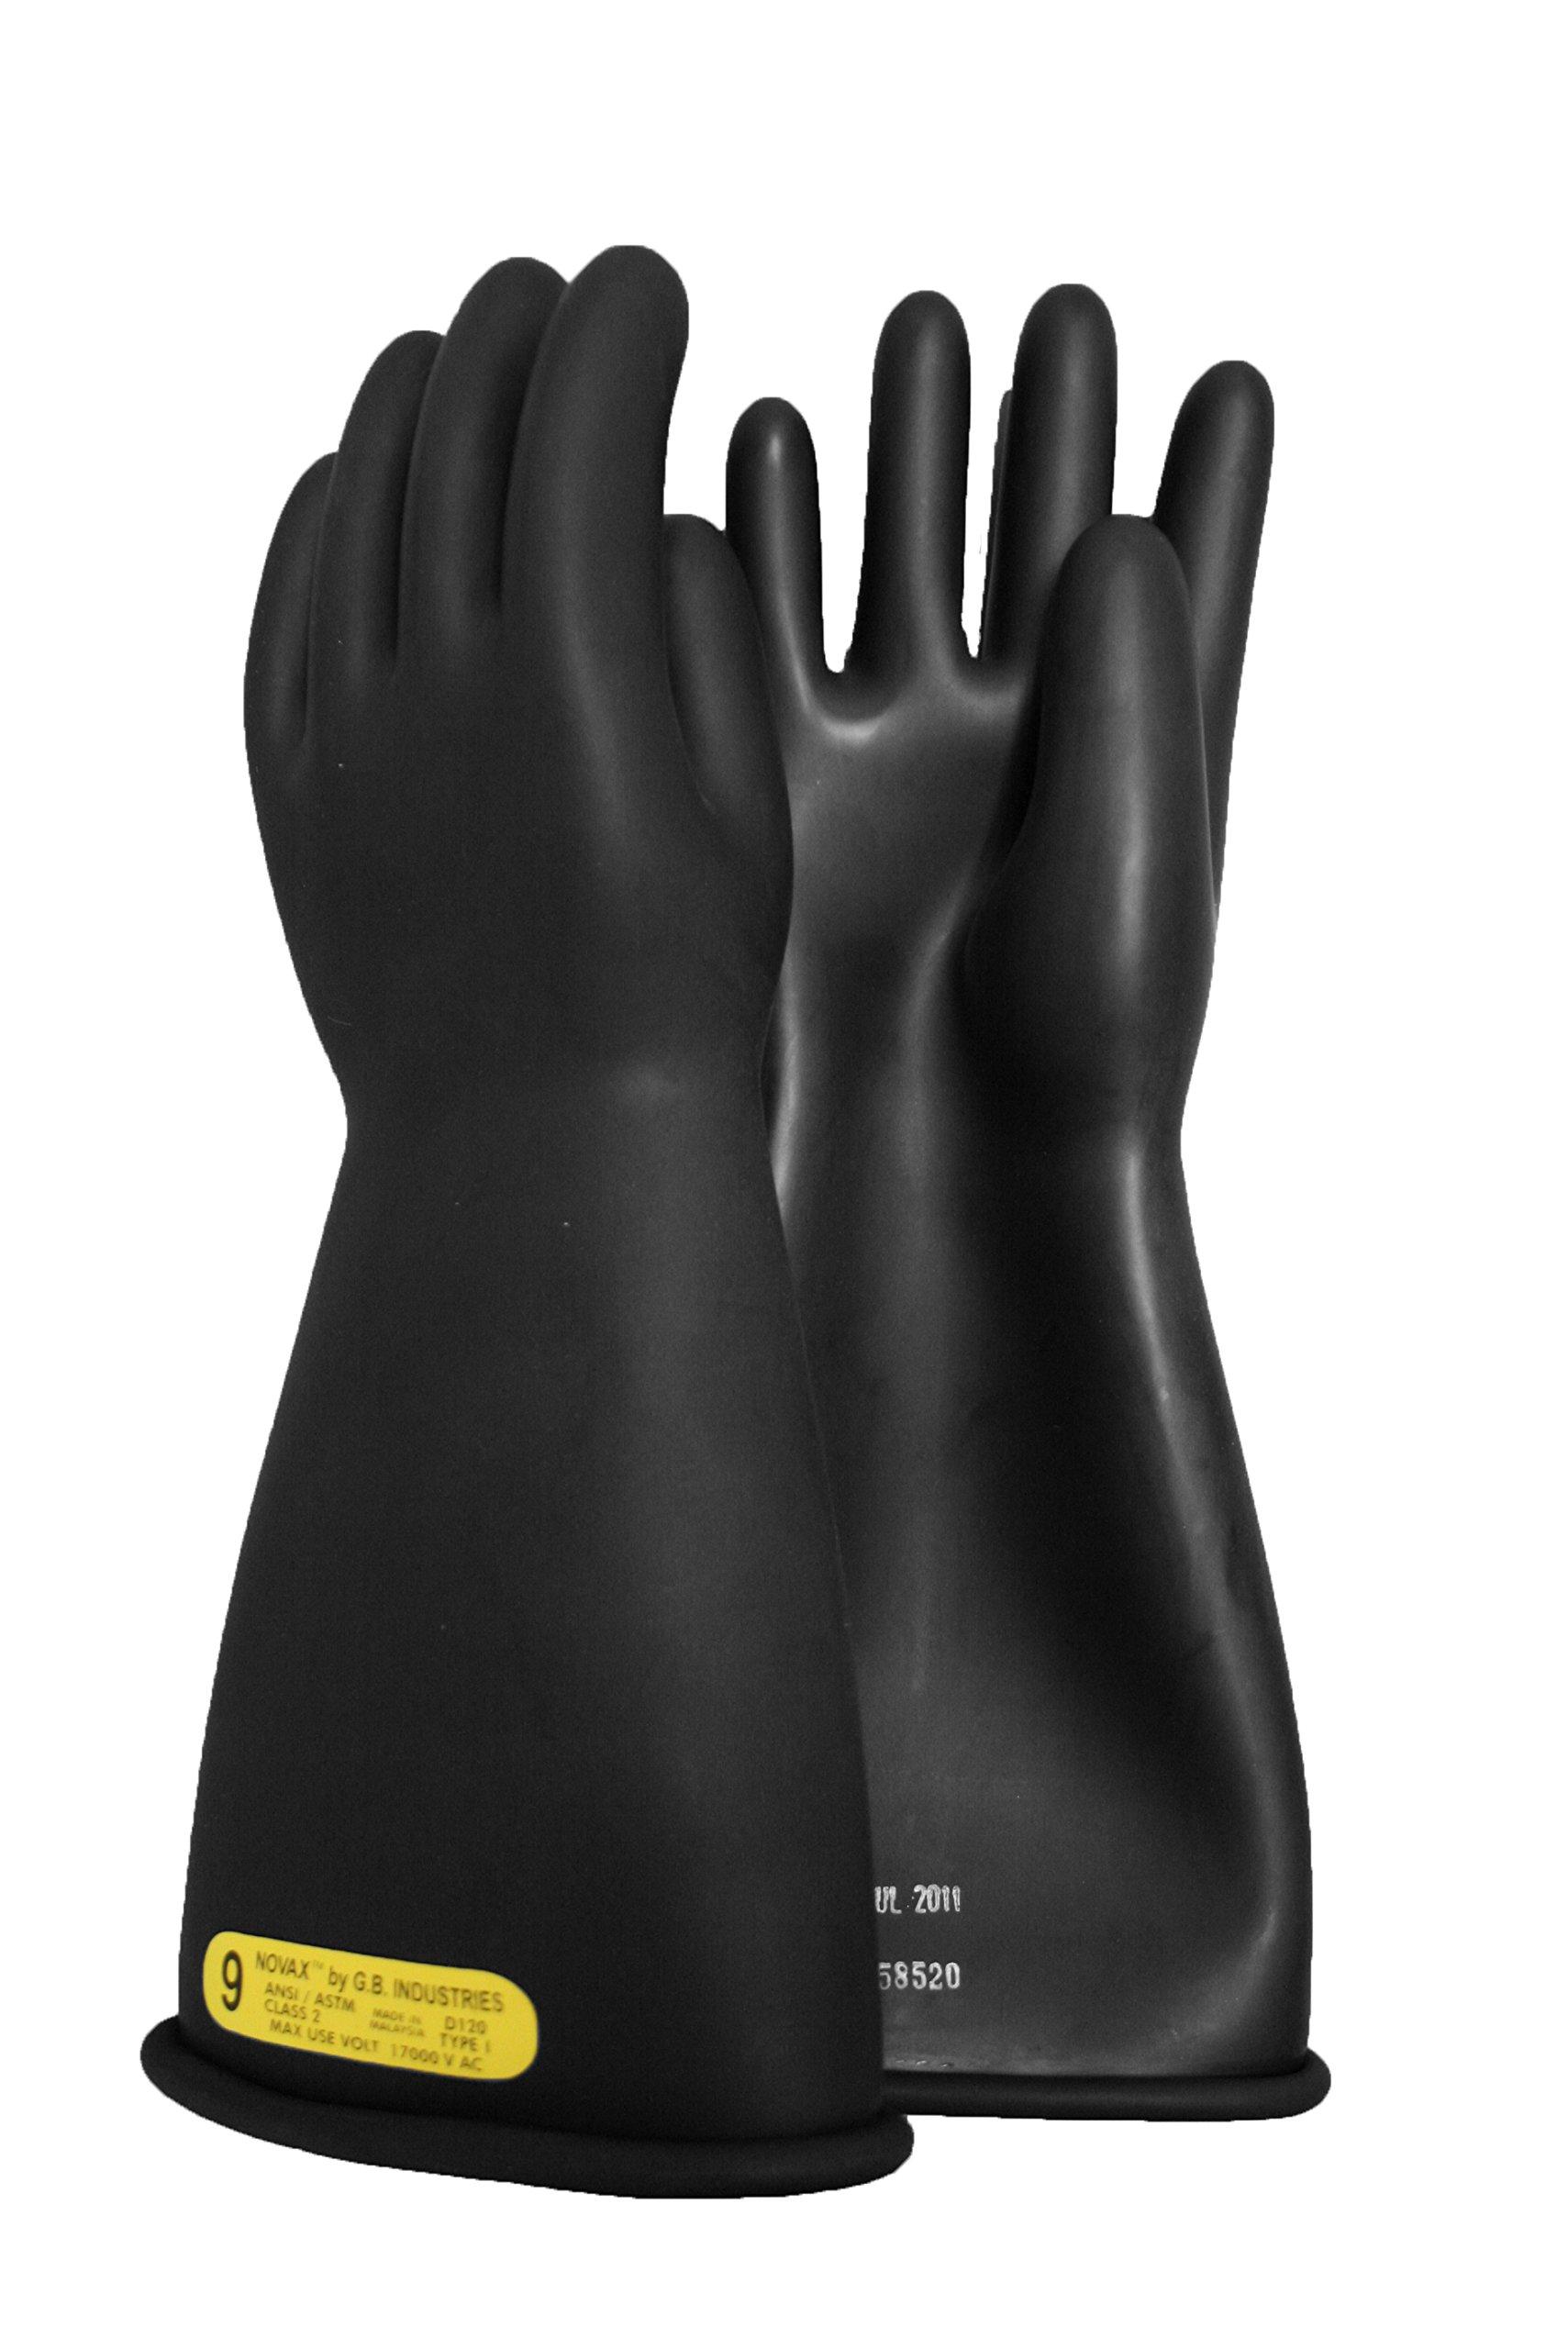 National Safety Apparel Class 2 Black Rubber Voltage Insulating Gloves, Max. Use Voltage 17000V AC/25500V DC (DW14210)